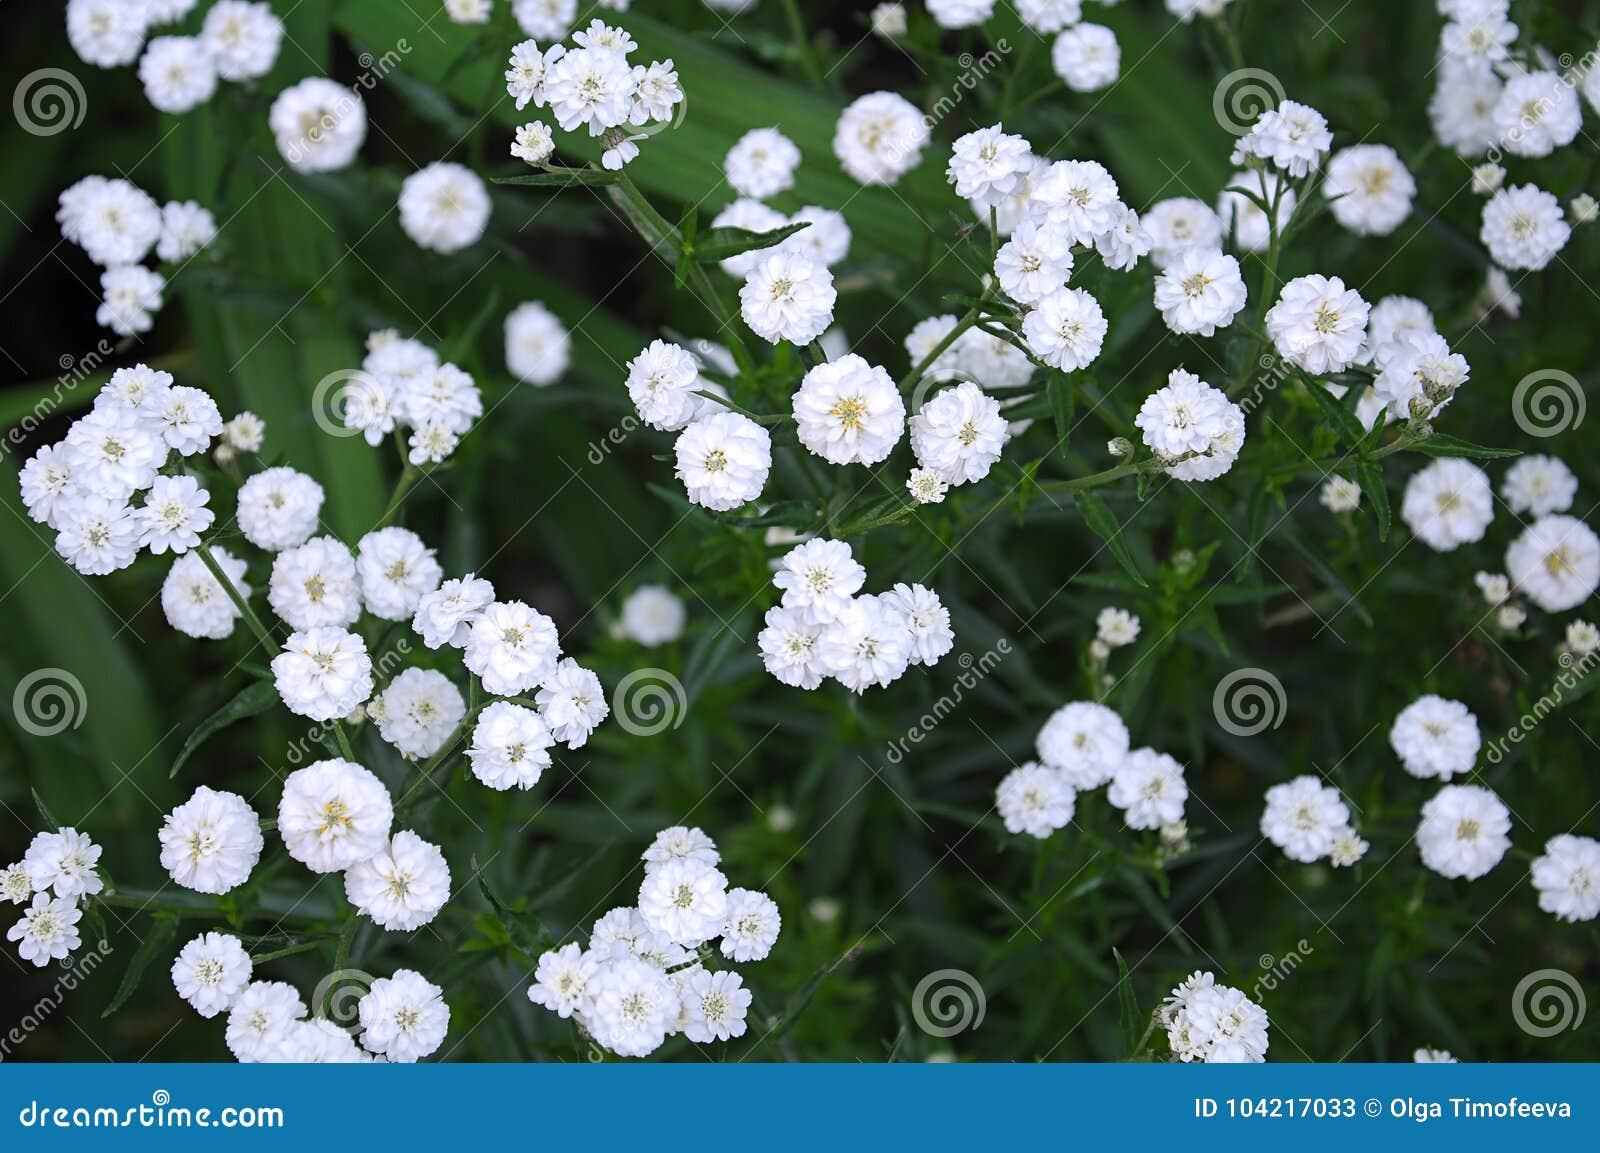 Tiny White Flowers Gypsophila Paniculata Stock Image Image Of